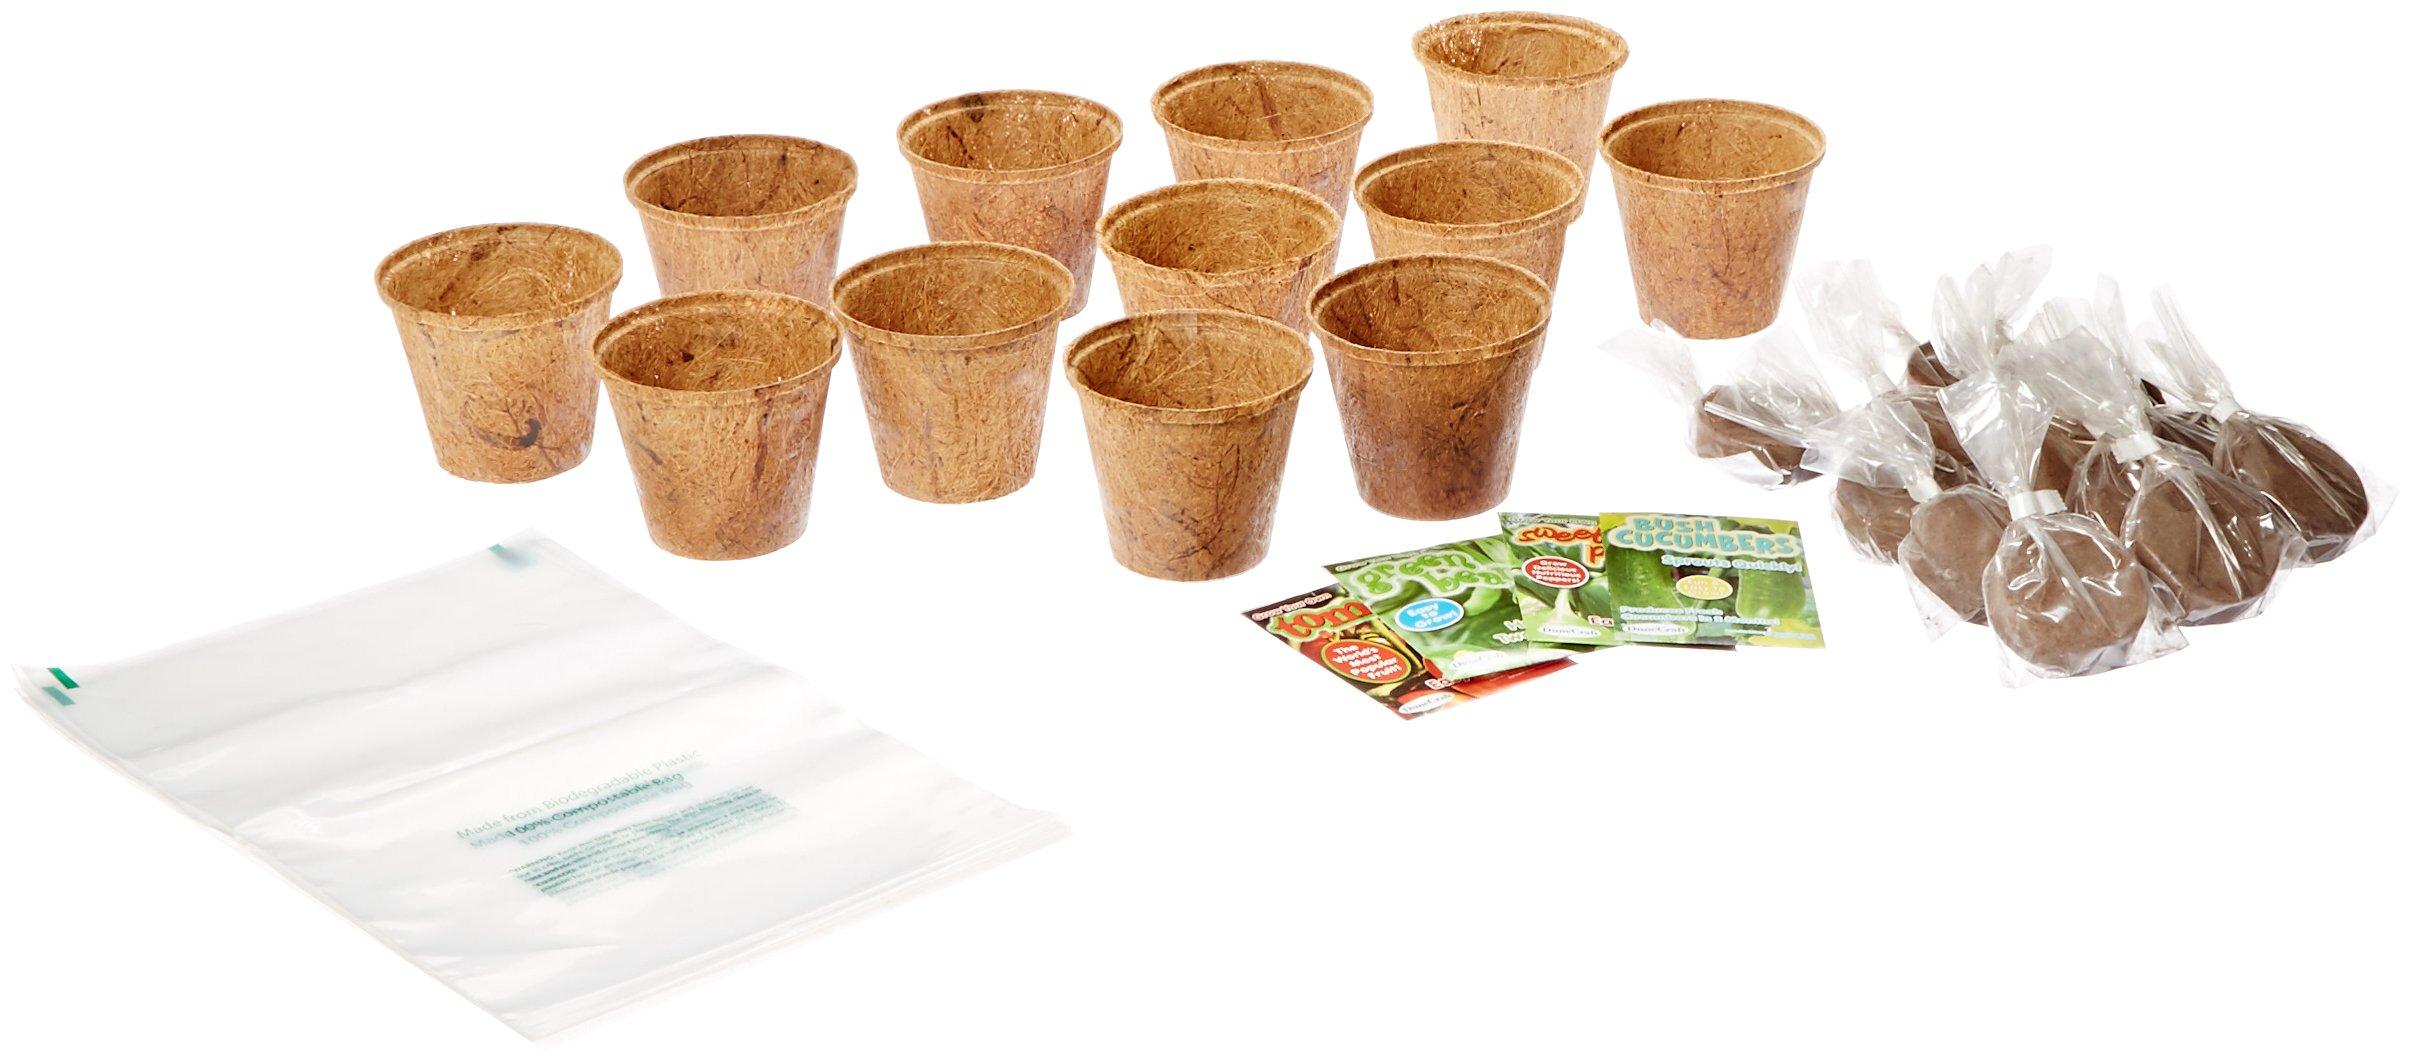 Dunecraft Organic Veggies Science Kit